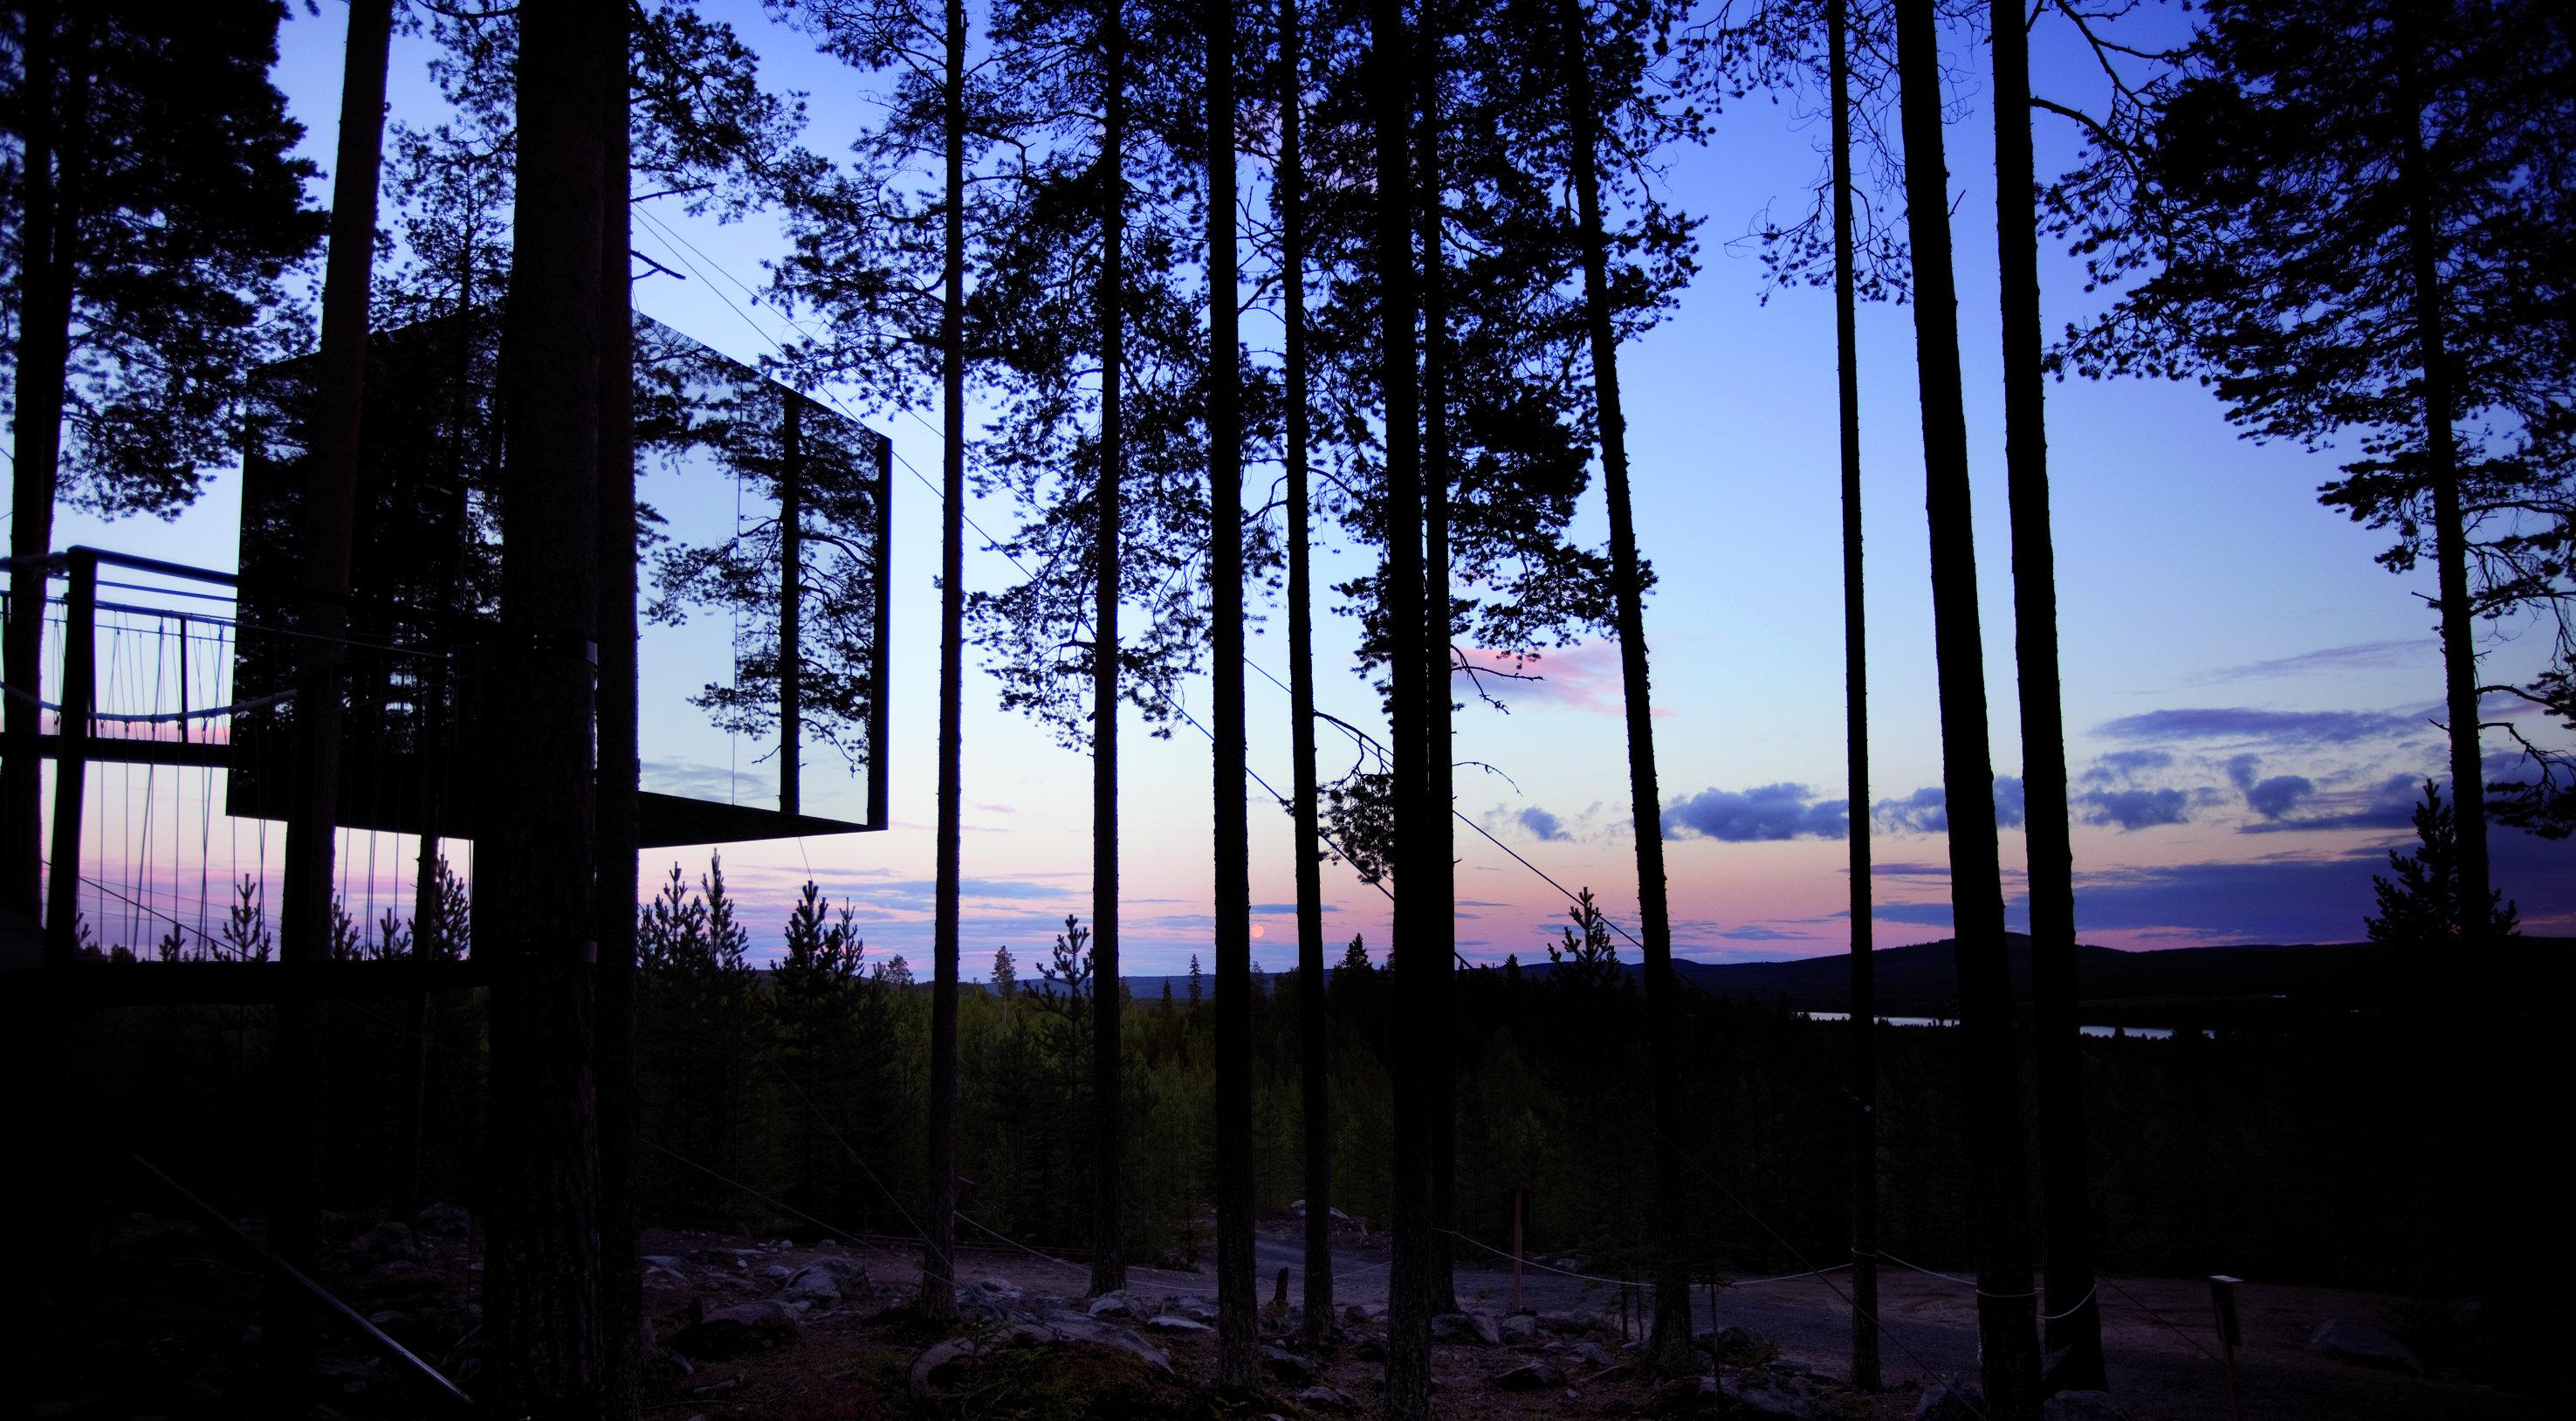 mirror_cube_exterior_dusk